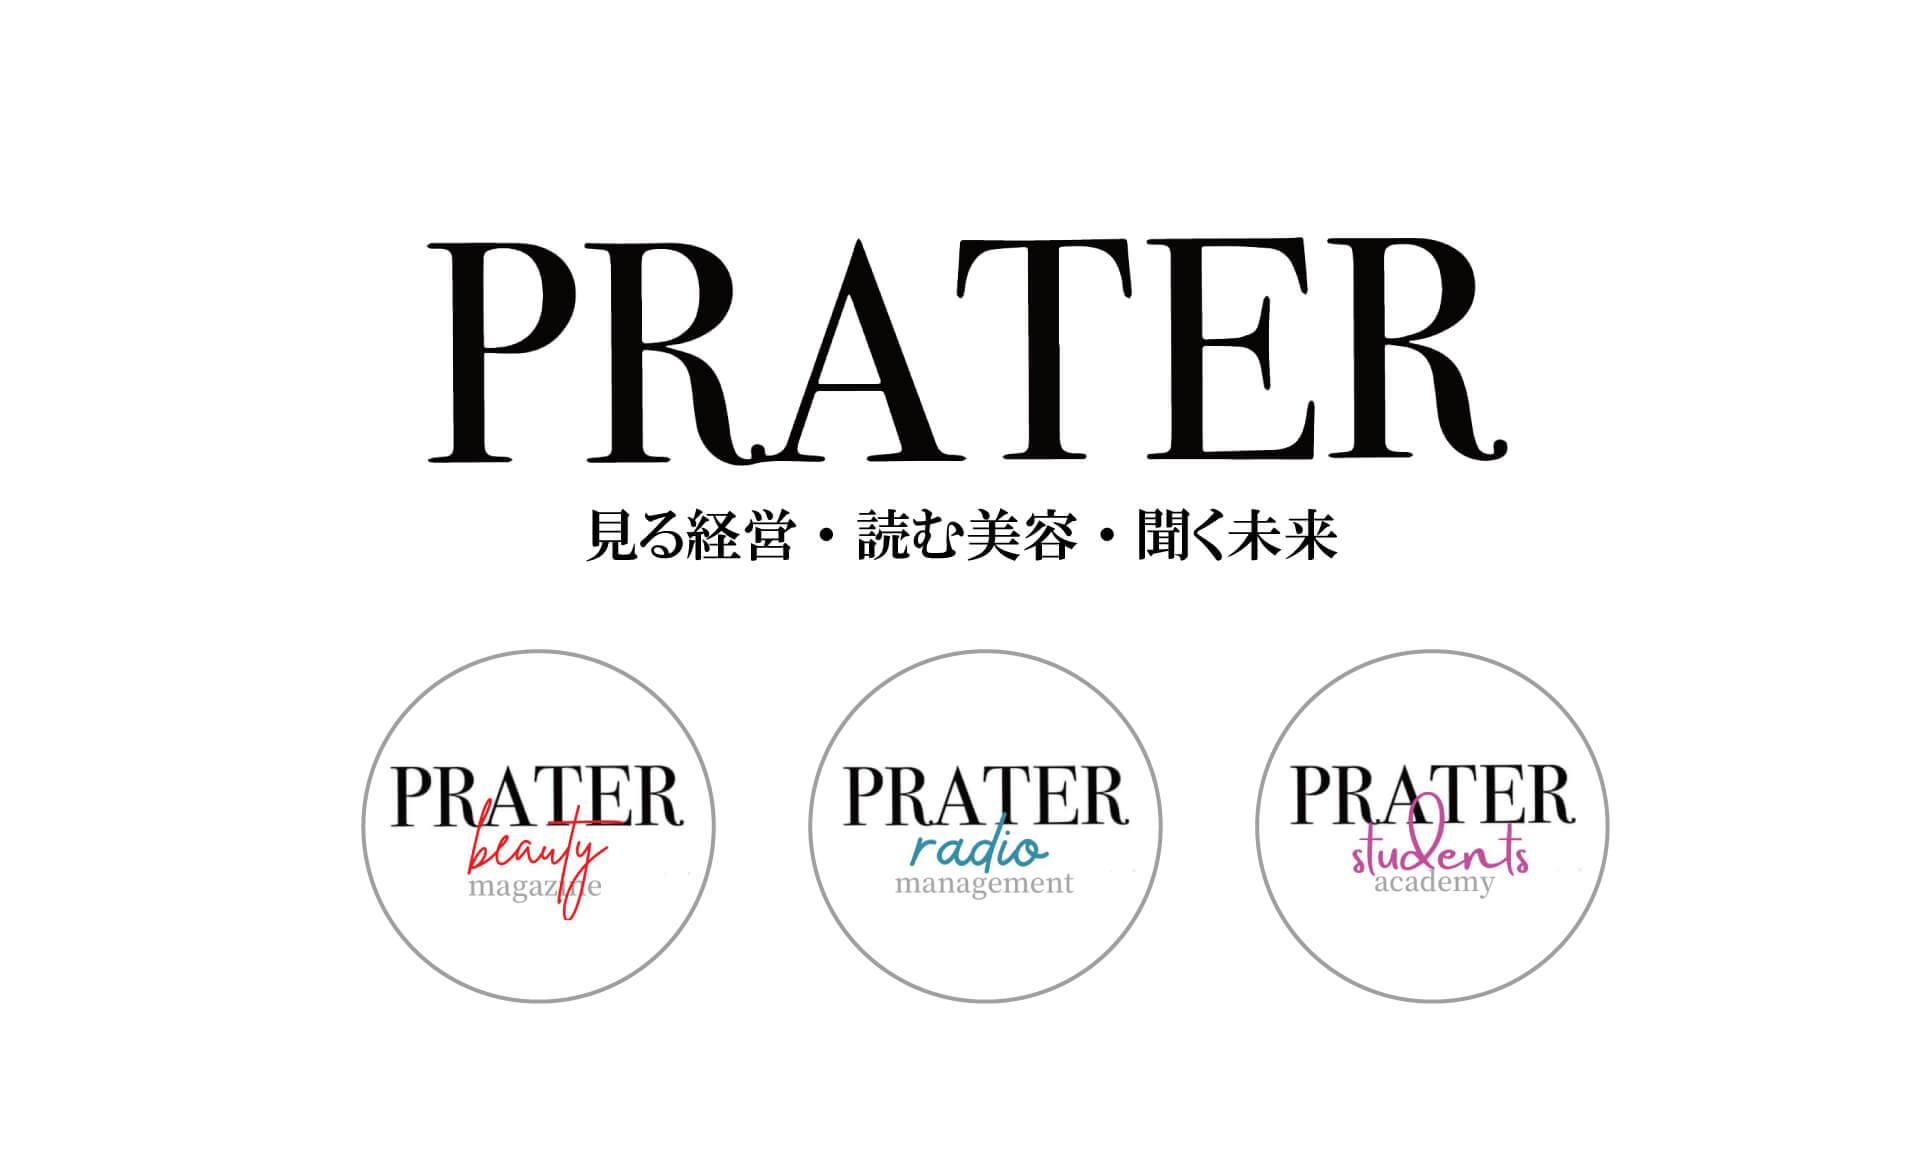 prater